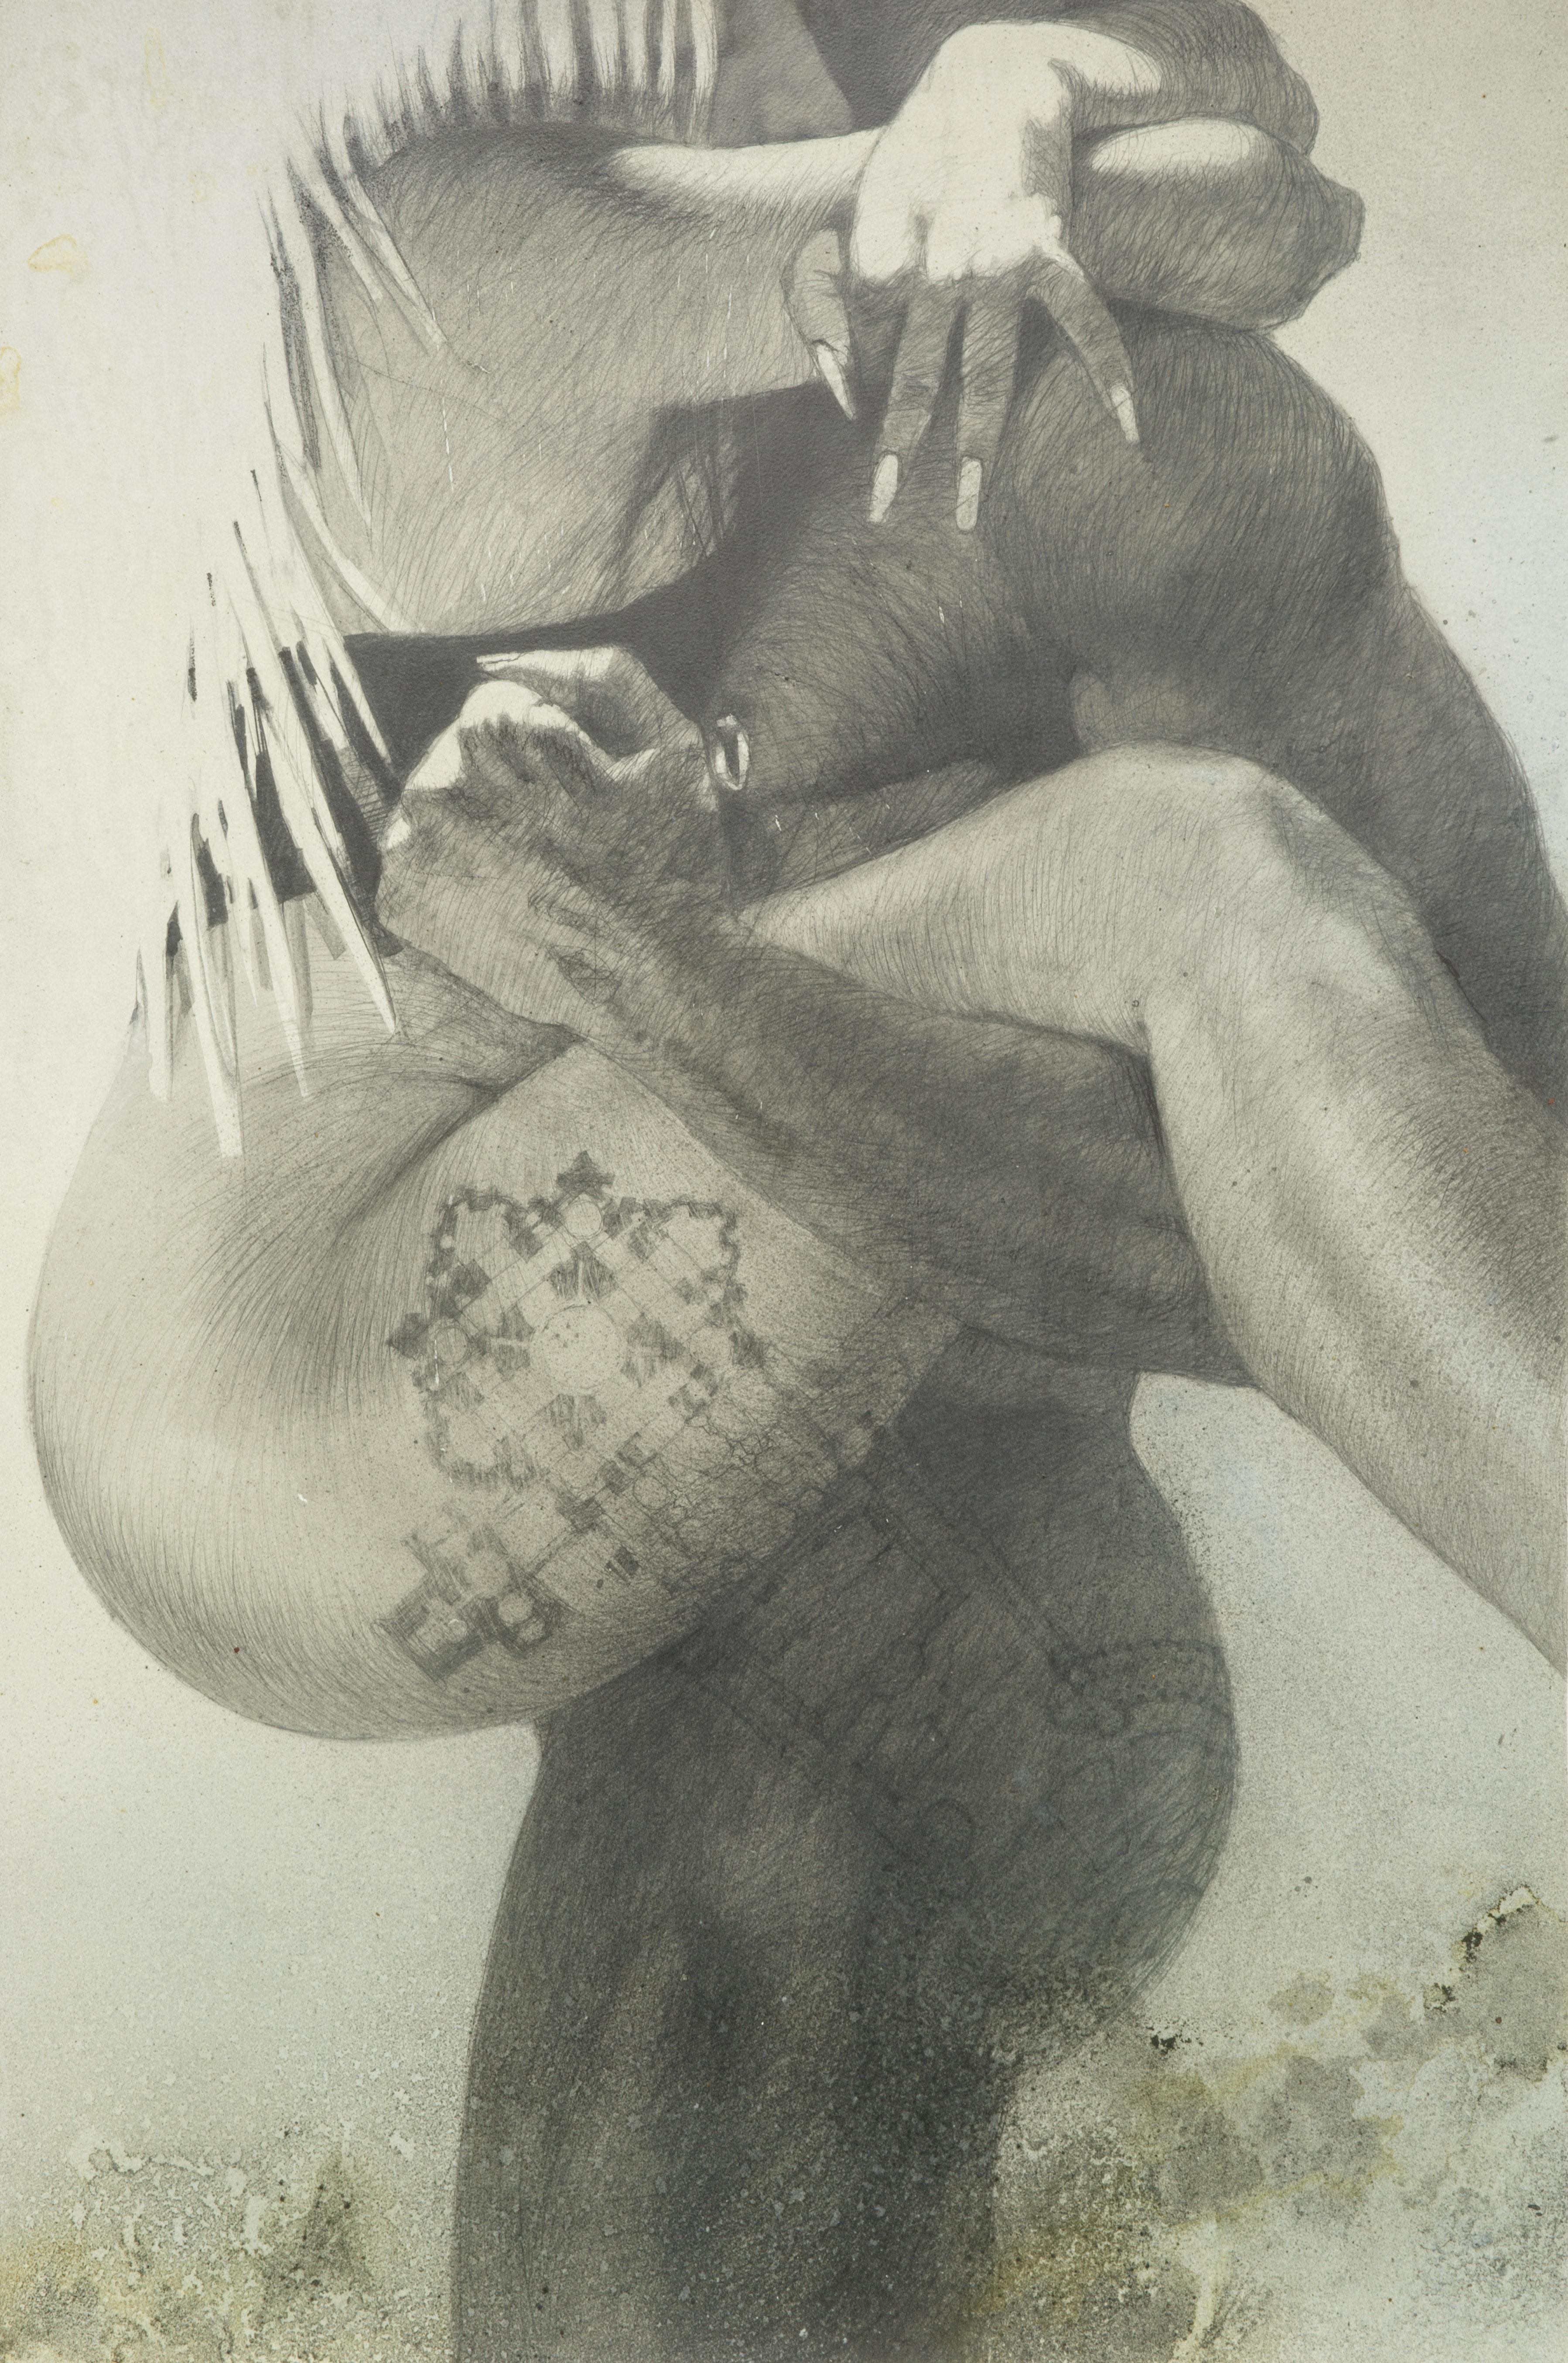 KIRILL CHELUSHKIN (RUSSIAN B. 1968)